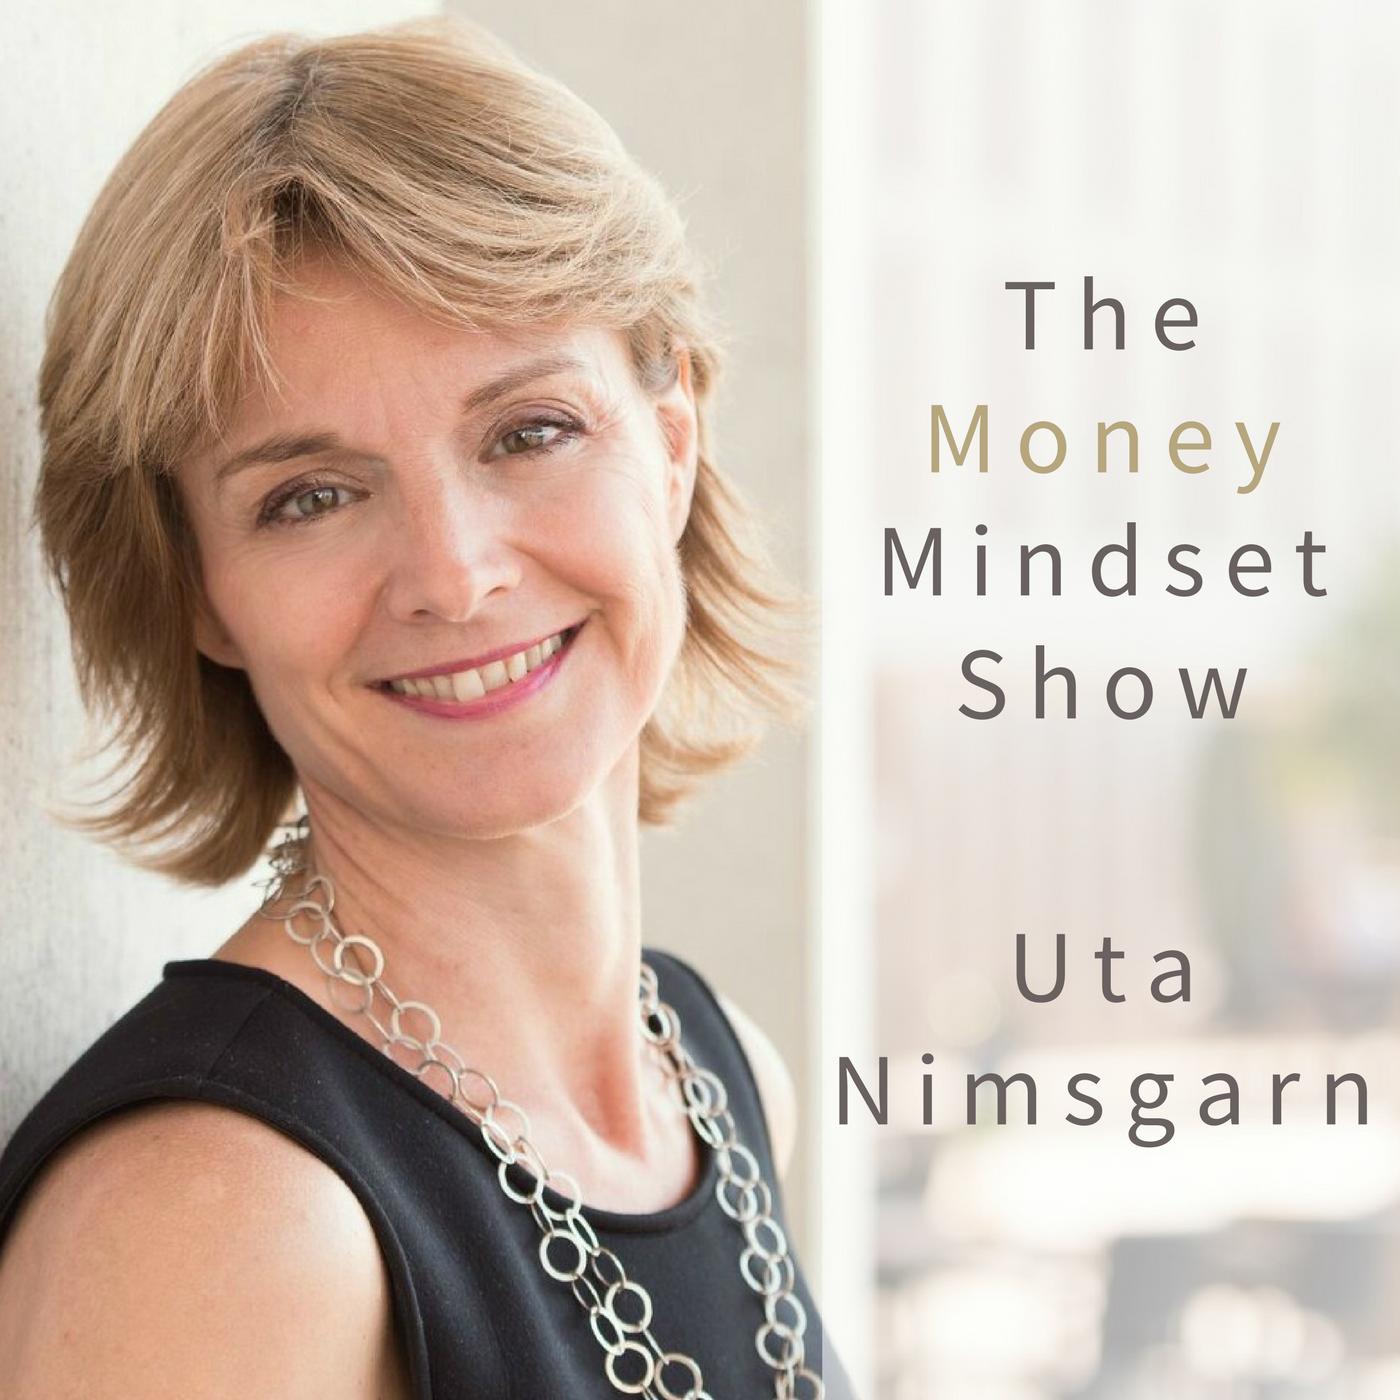 Uta-Nimsgarn. The Money-Mindset Show